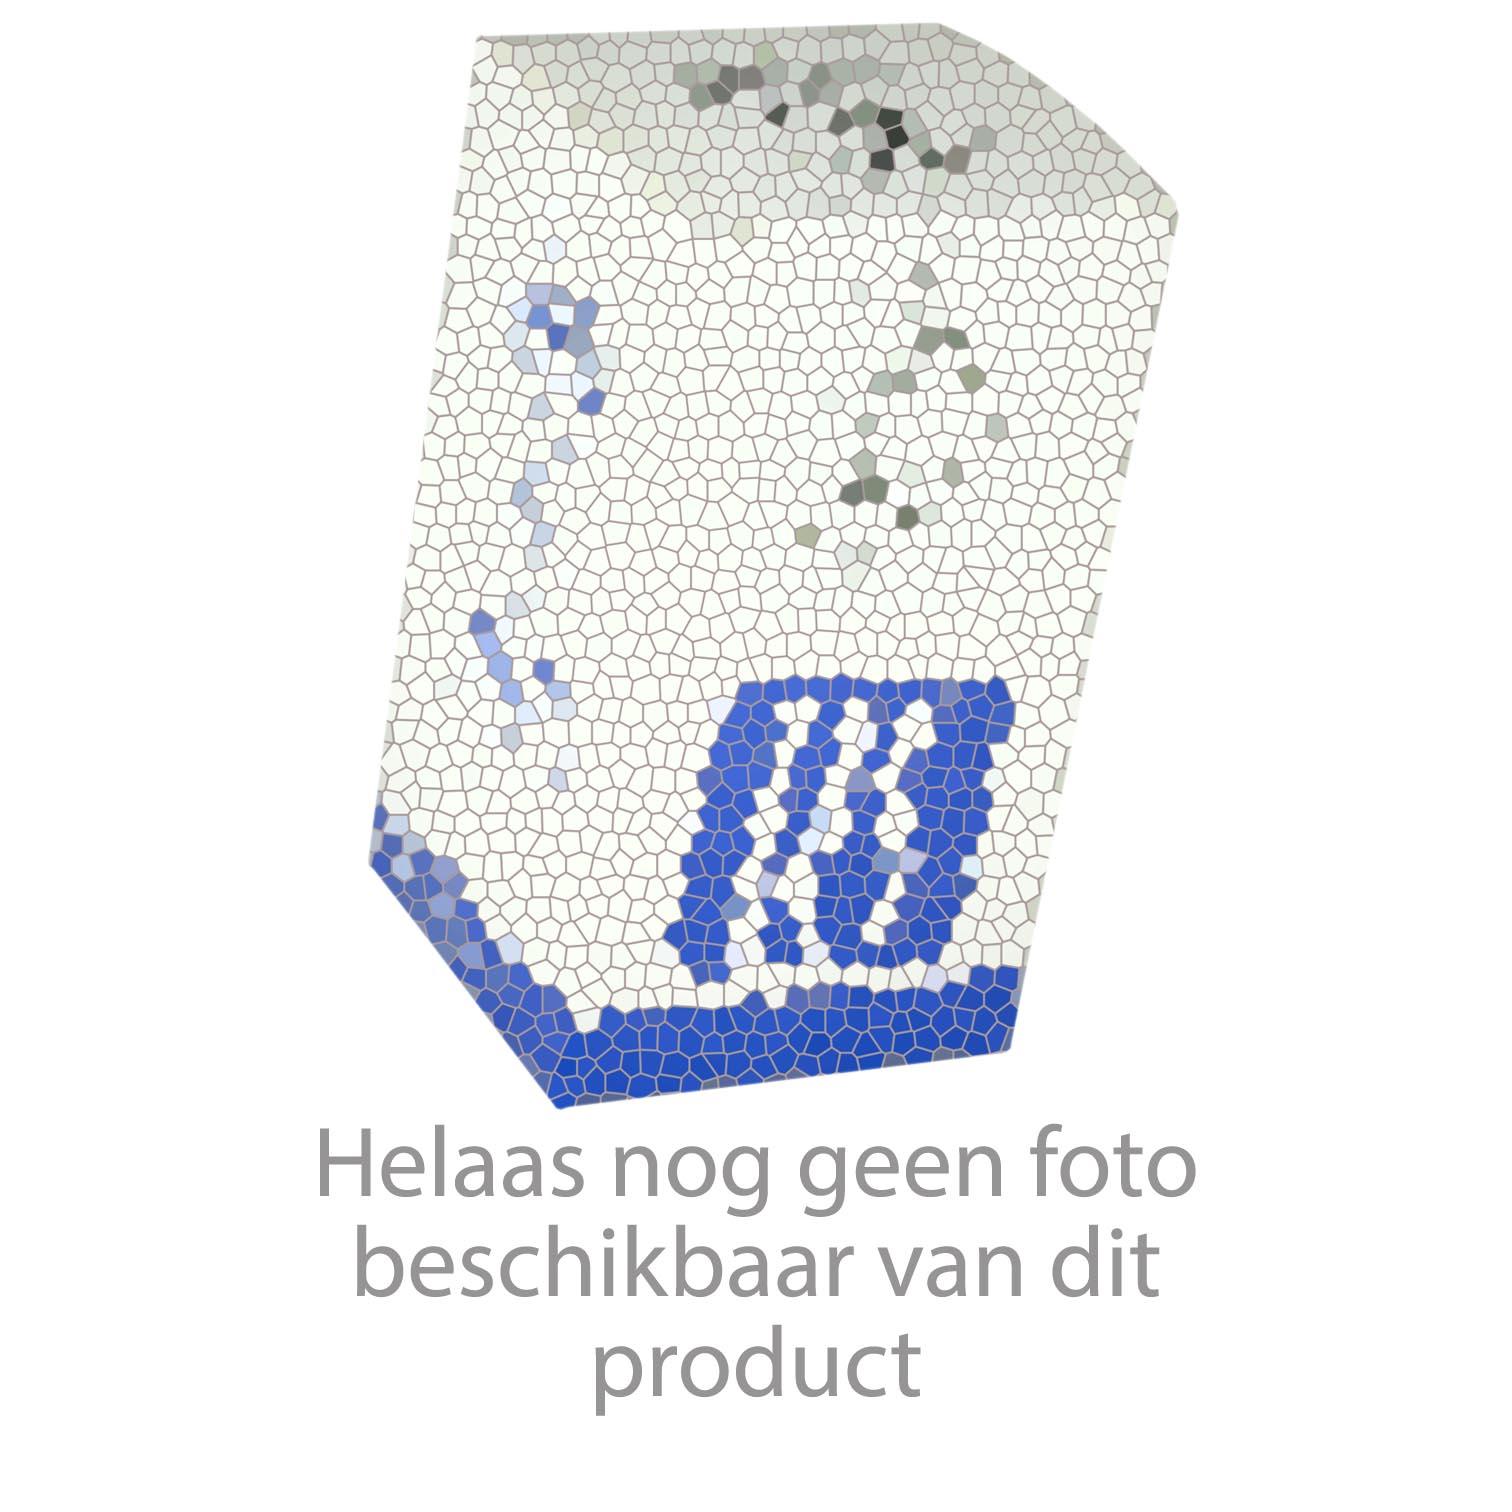 Geberit Veertje bedieningsplaat Delta/Bolero/Kappa setje 10 stuks Artikelnummer 241.295.00.1